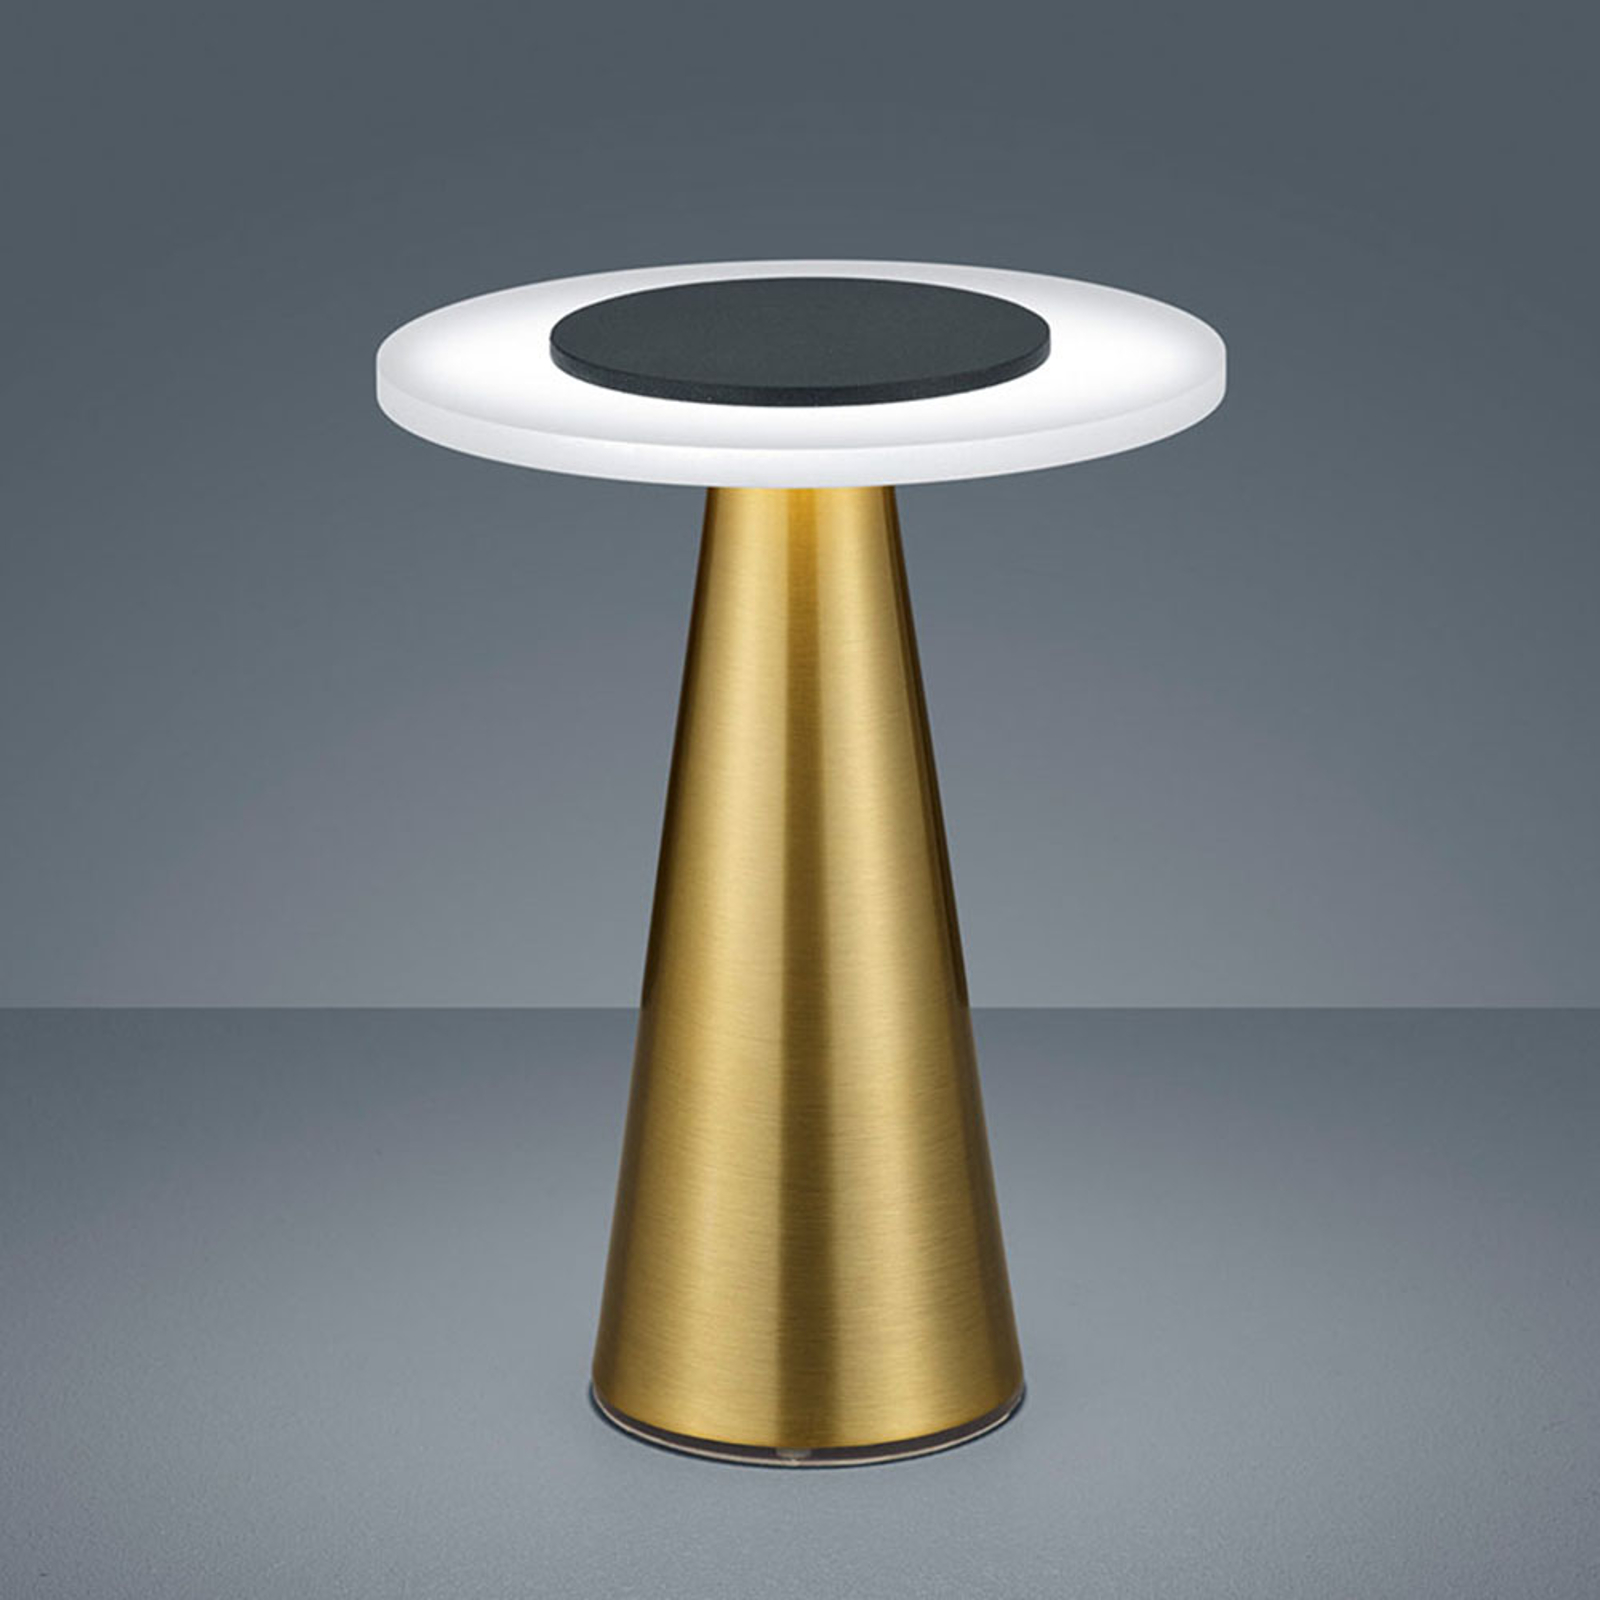 Helestra Bax da tavolo con touchdimmer, ottone